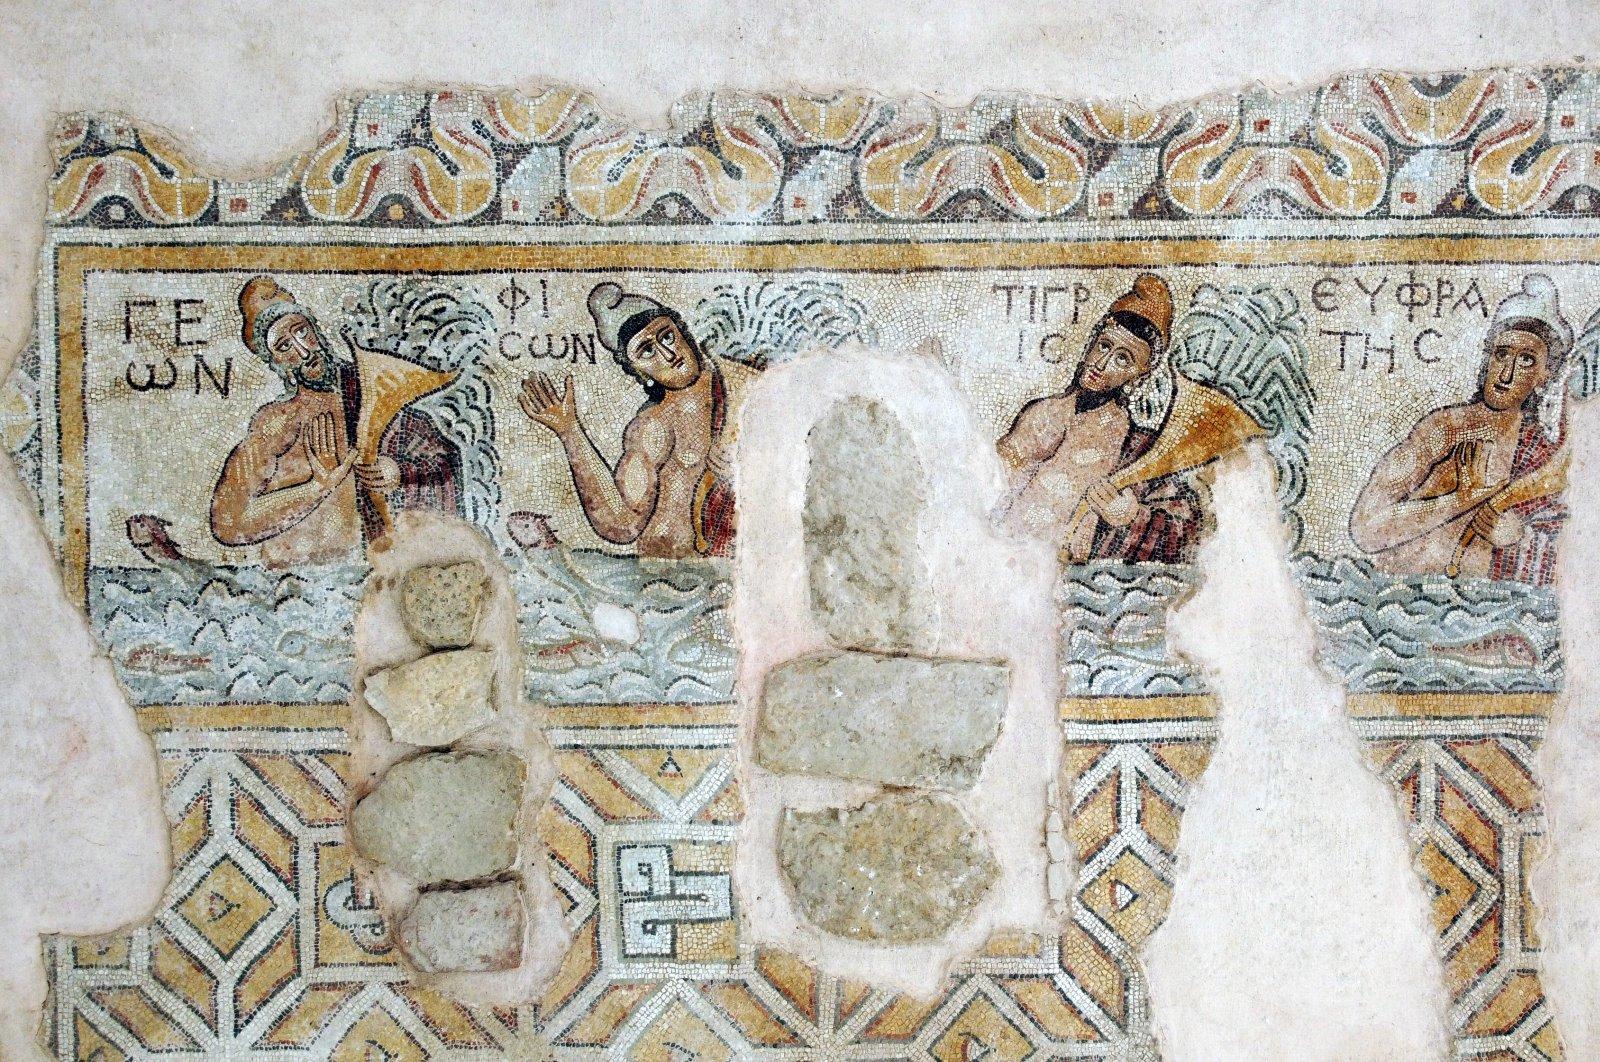 A mosaic on the floor of Church B in the ancient city of Hadrianopolis, Karabük, northern Turkey, Feb. 8, 2020. (AA PHOTO)